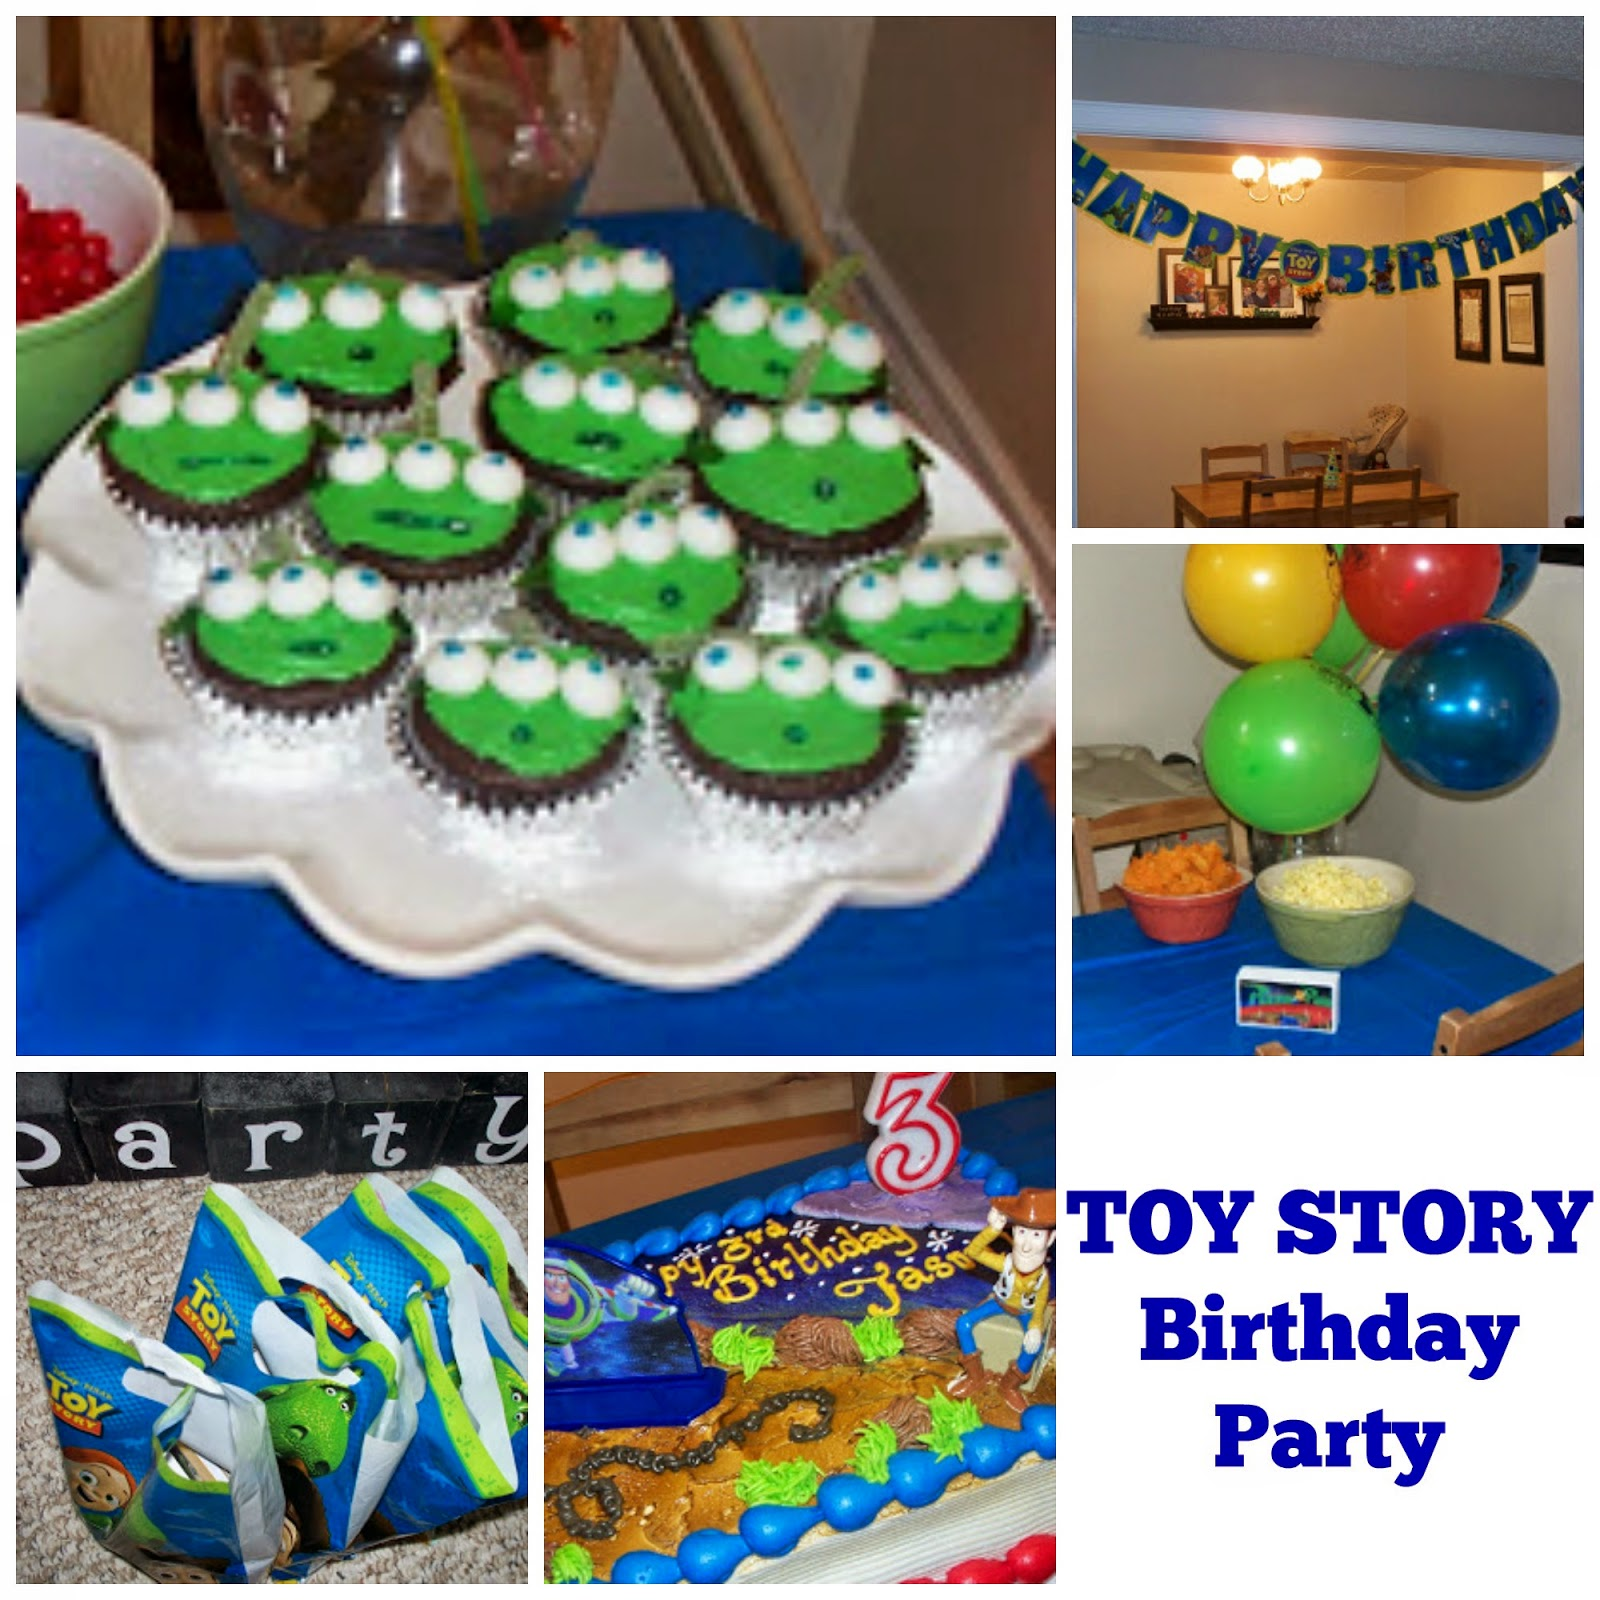 http://craftingandcreativity.blogspot.ca/2011/05/boys-3rd-birthday-party-toy-story-theme.html